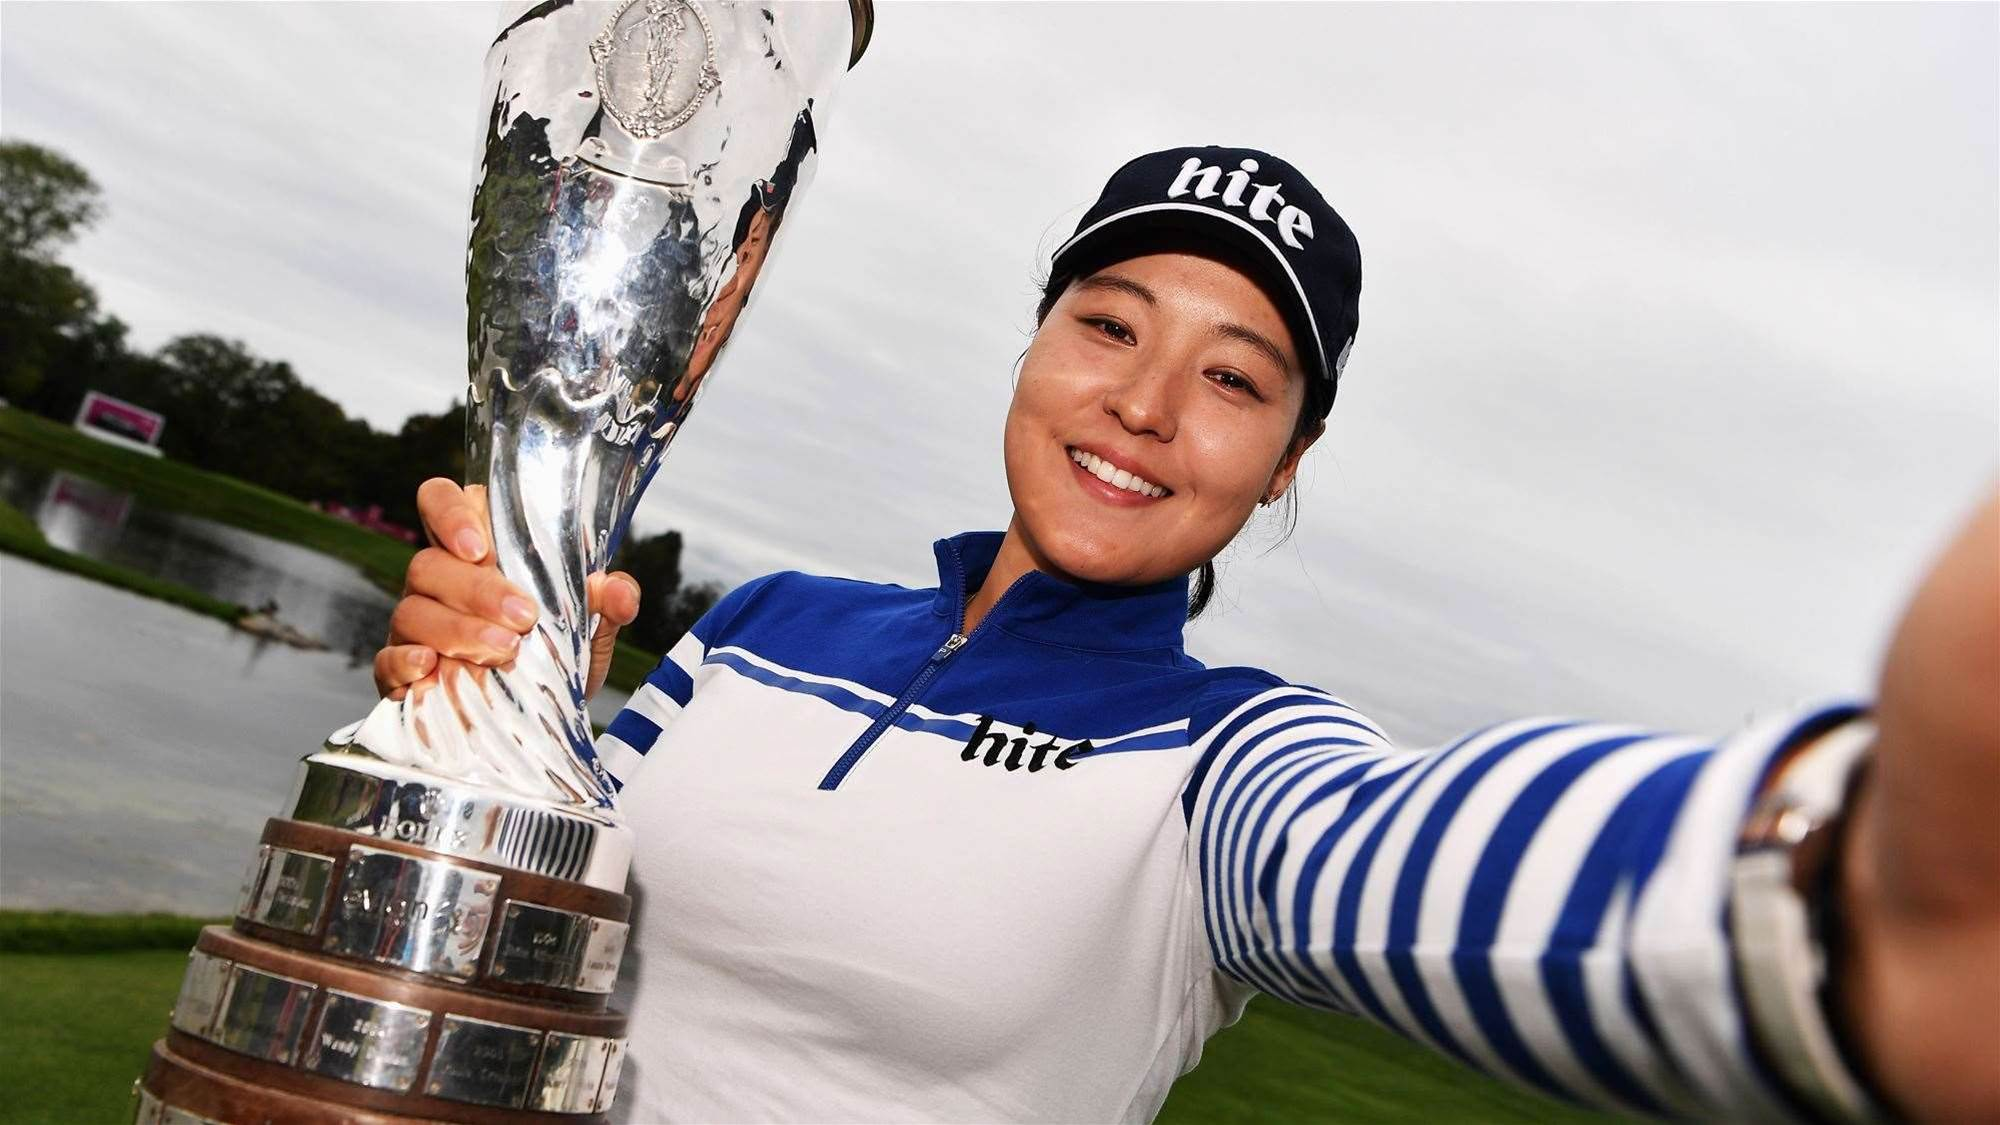 LPGA: Chun sets new major record with Evian win